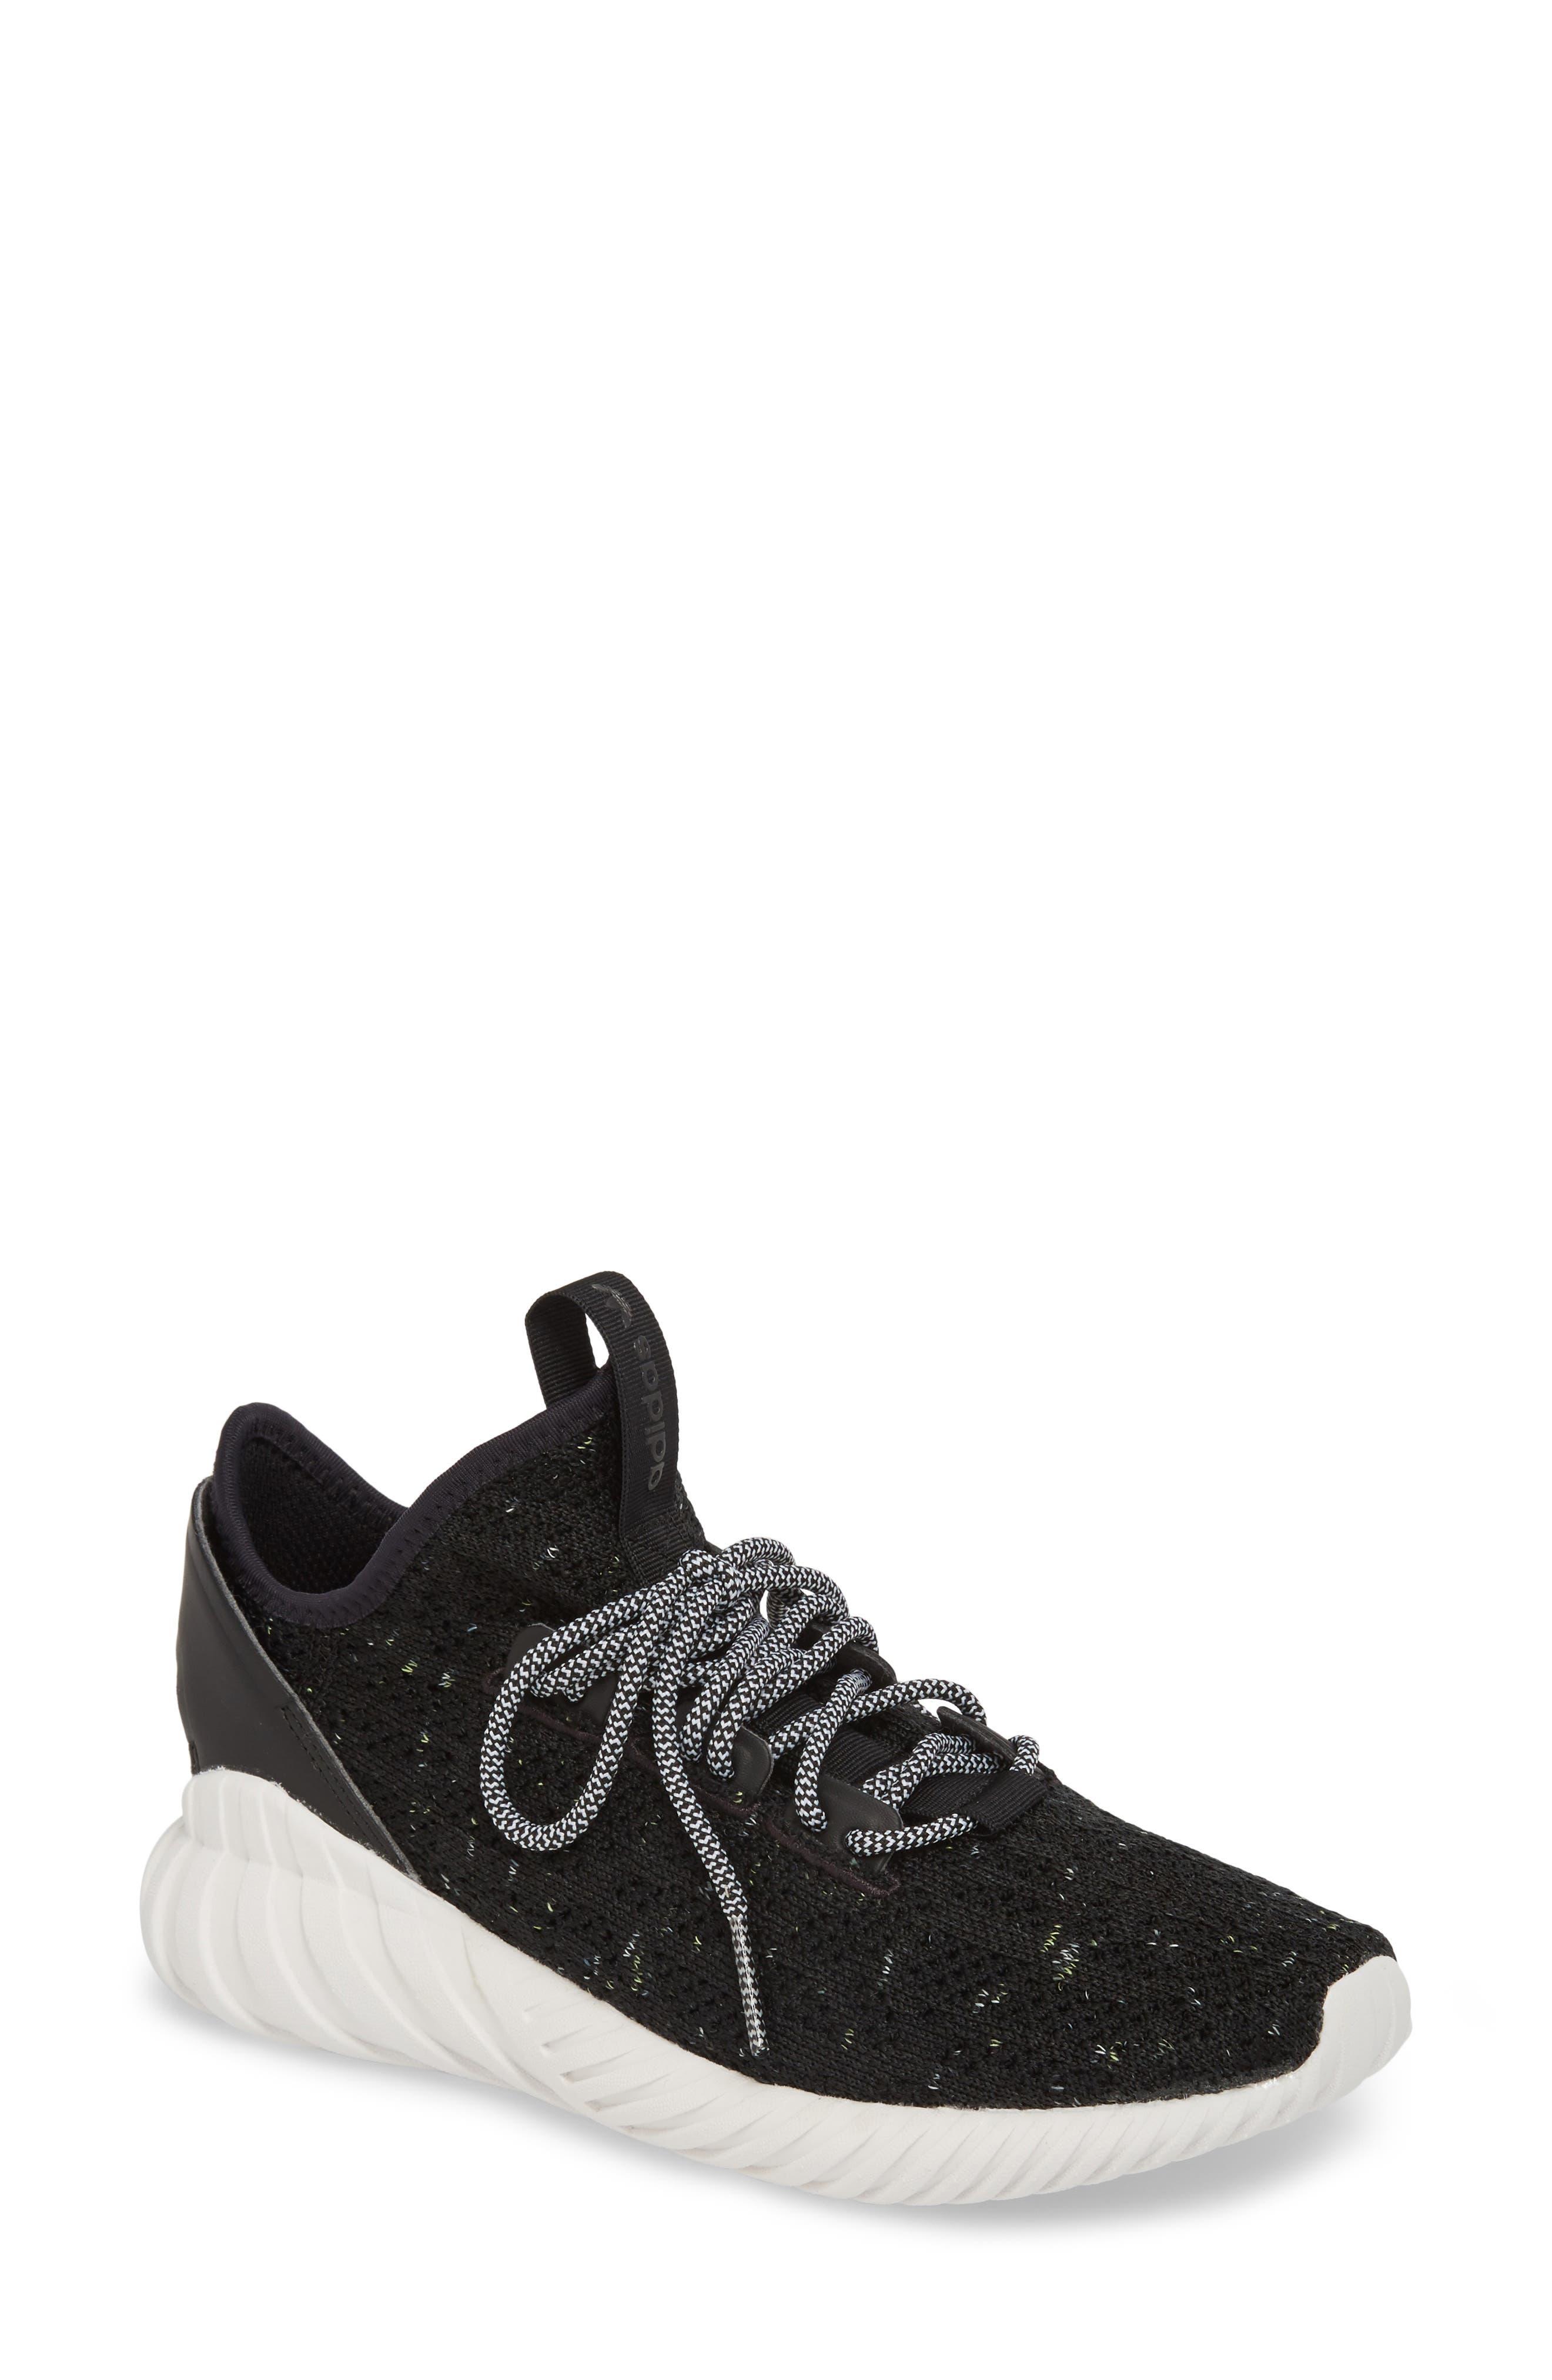 Alternate Image 1 Selected - adidas Tubular Doom Sock Primeknit Sneaker (Women)